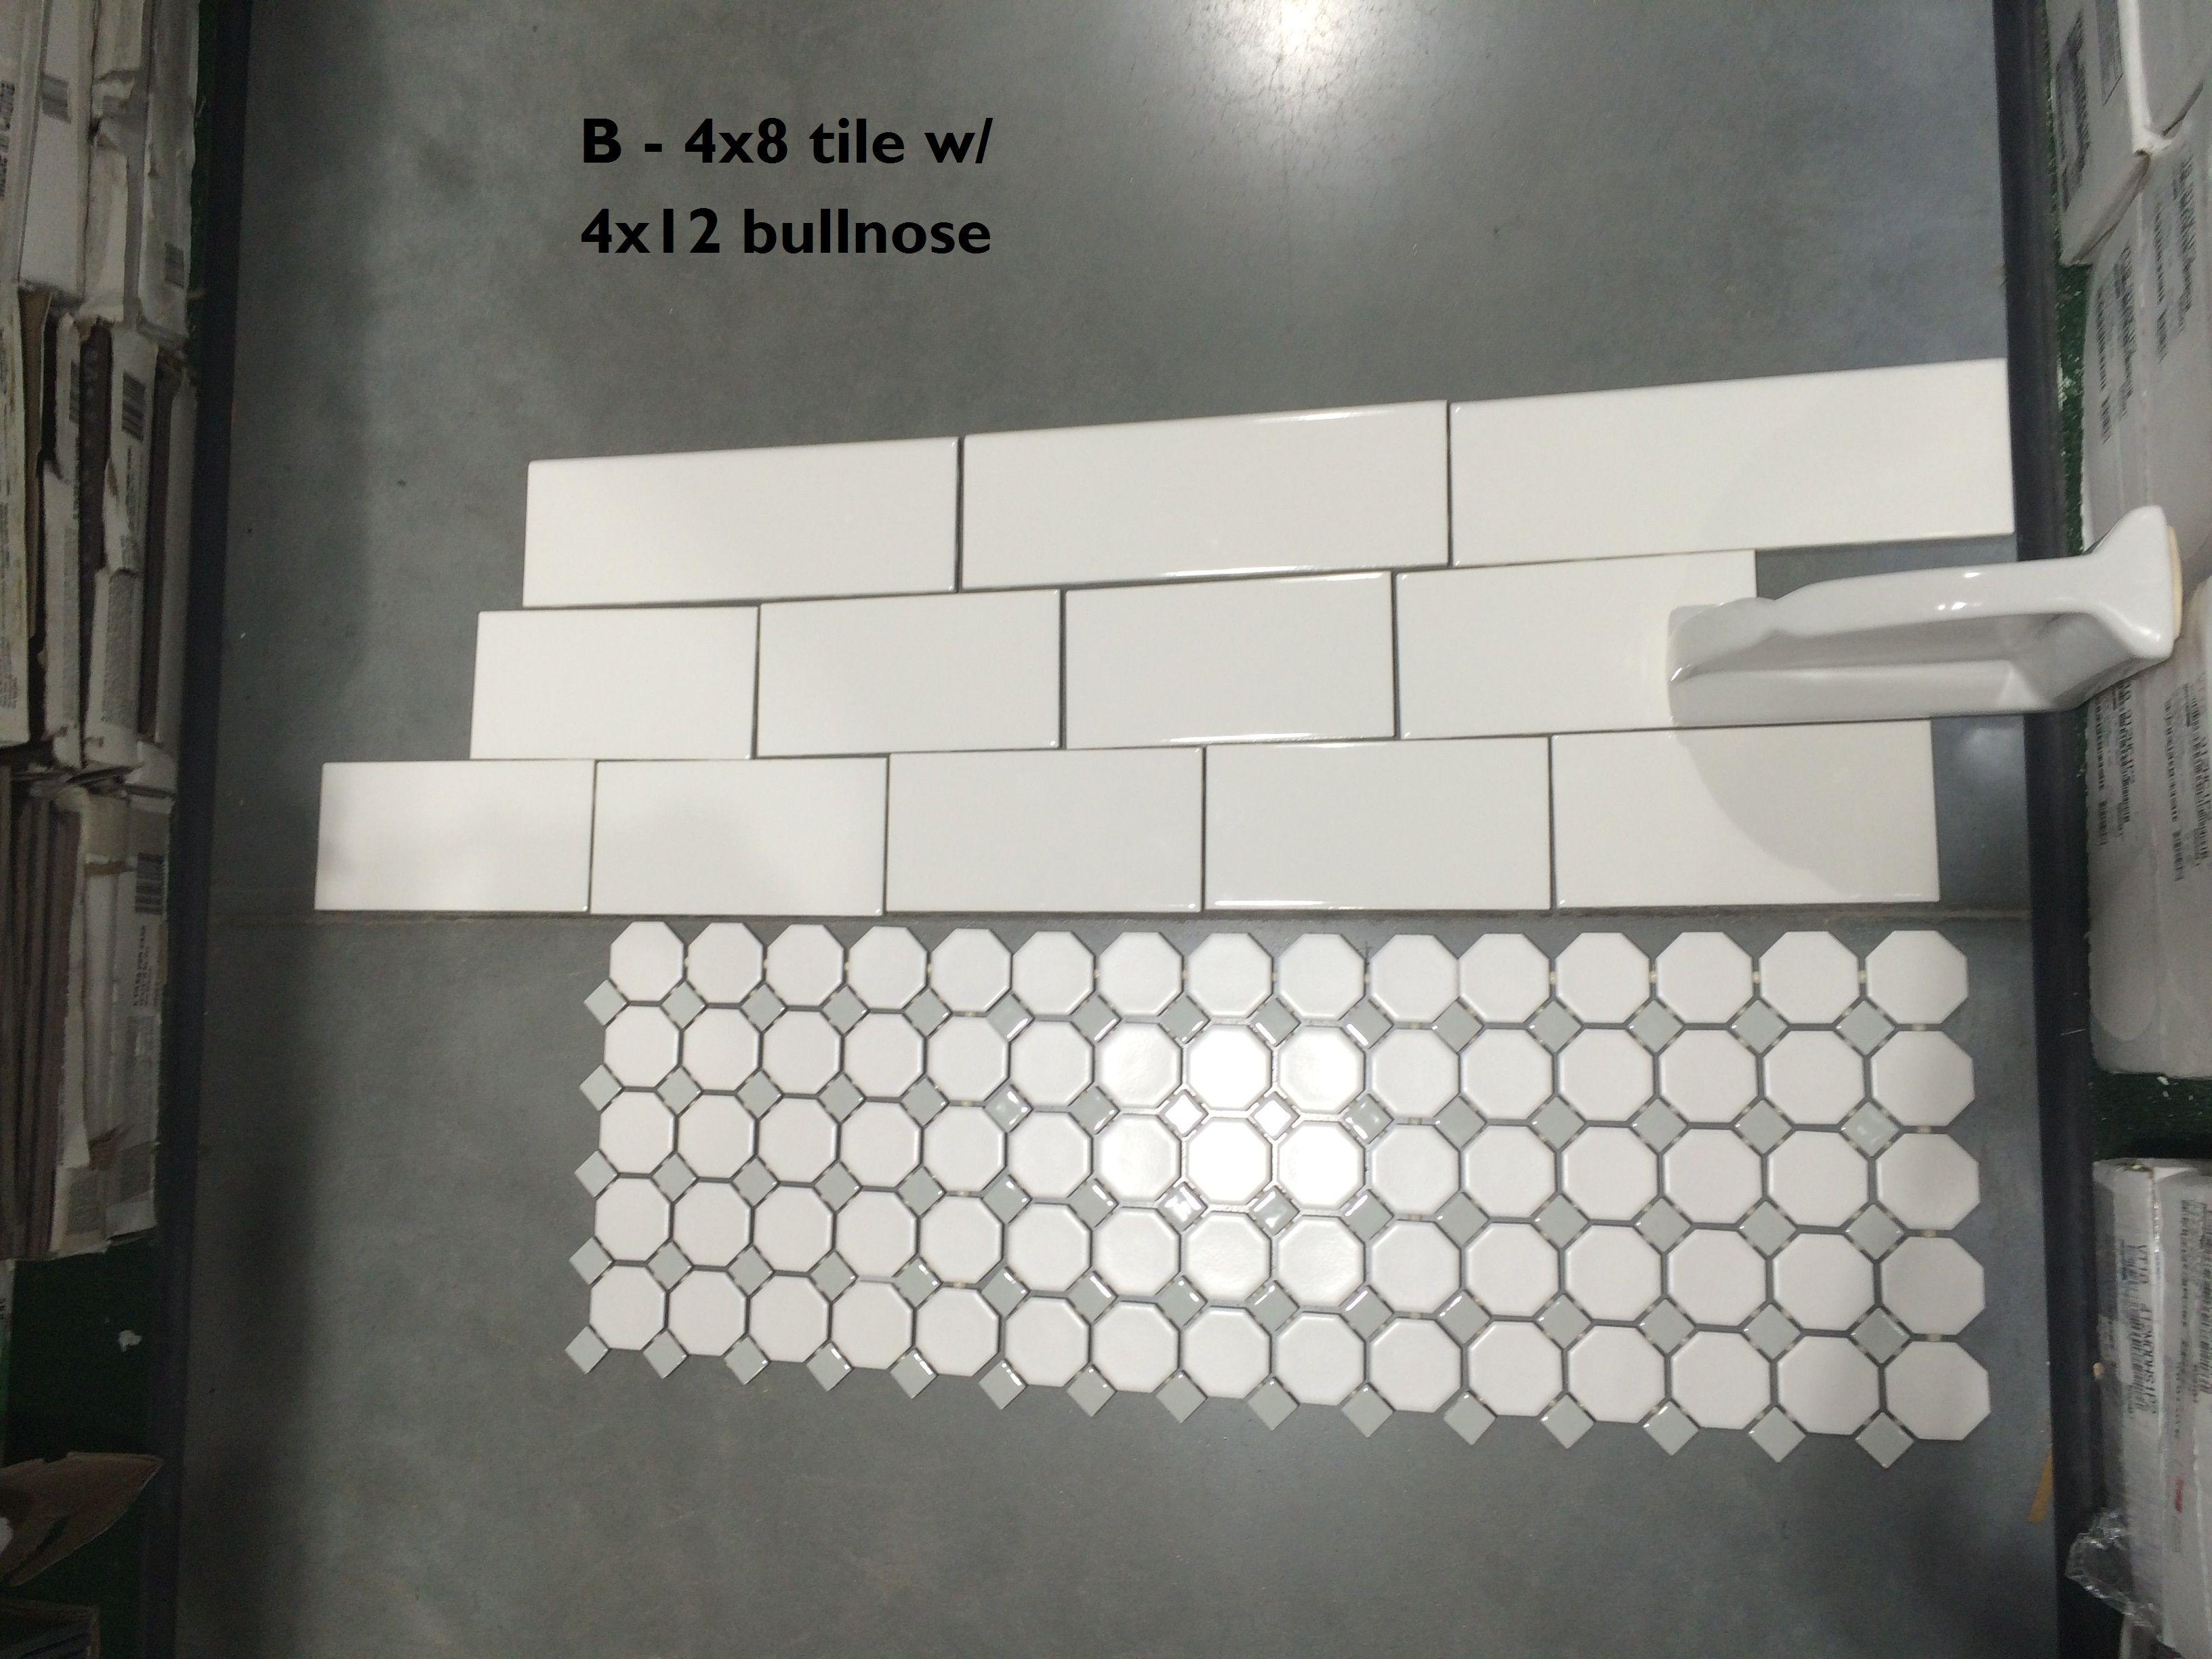 B - 4x8 brick with 4x12 bullnose | Bathroom Reno | Pinterest ...